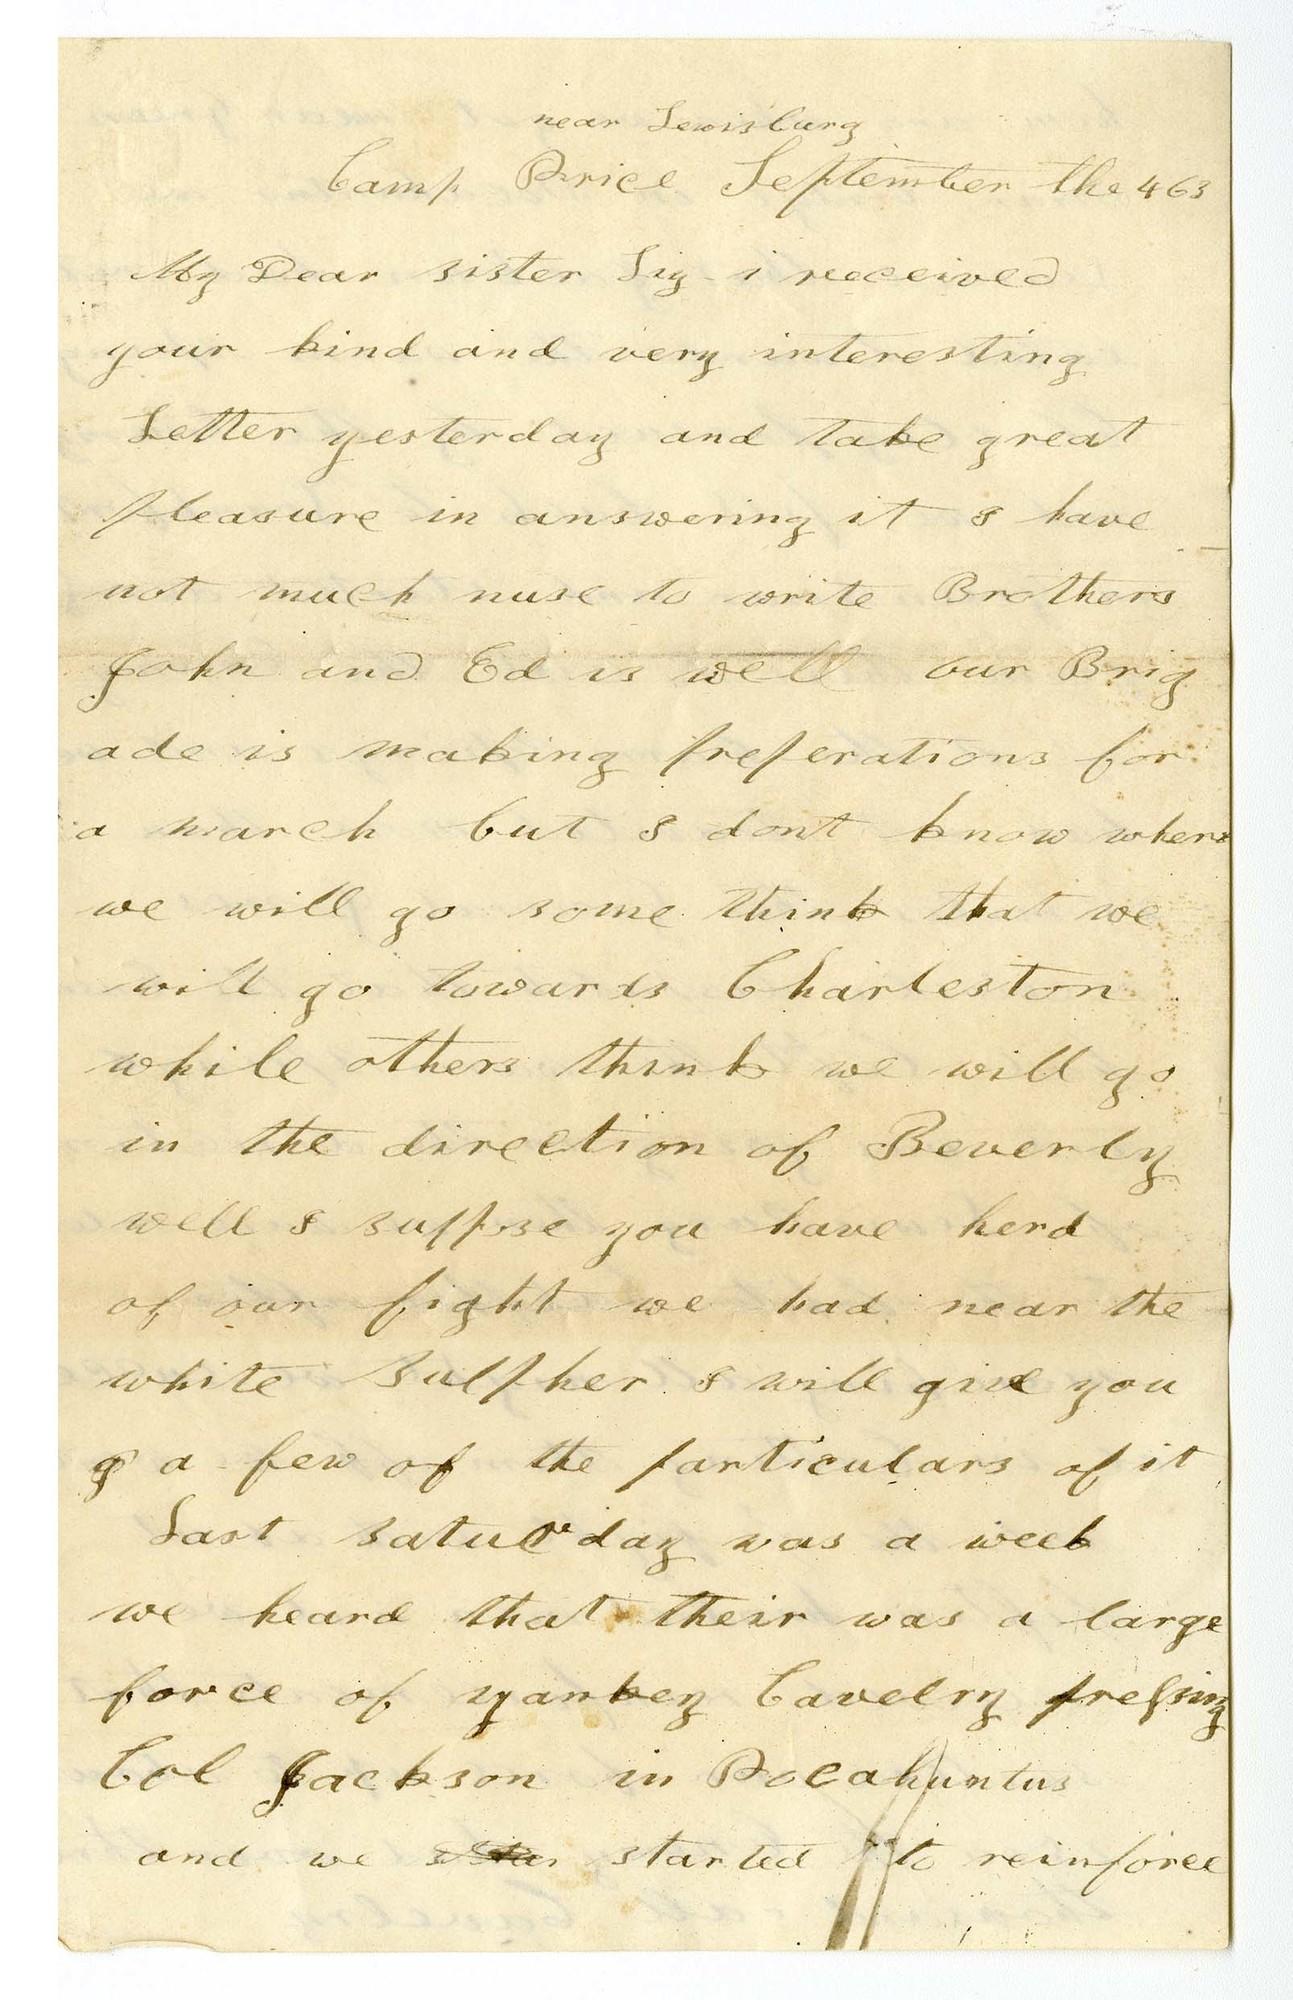 Ms1996_008_CarpenterHenryC_Letter_1863_0904a.jpg